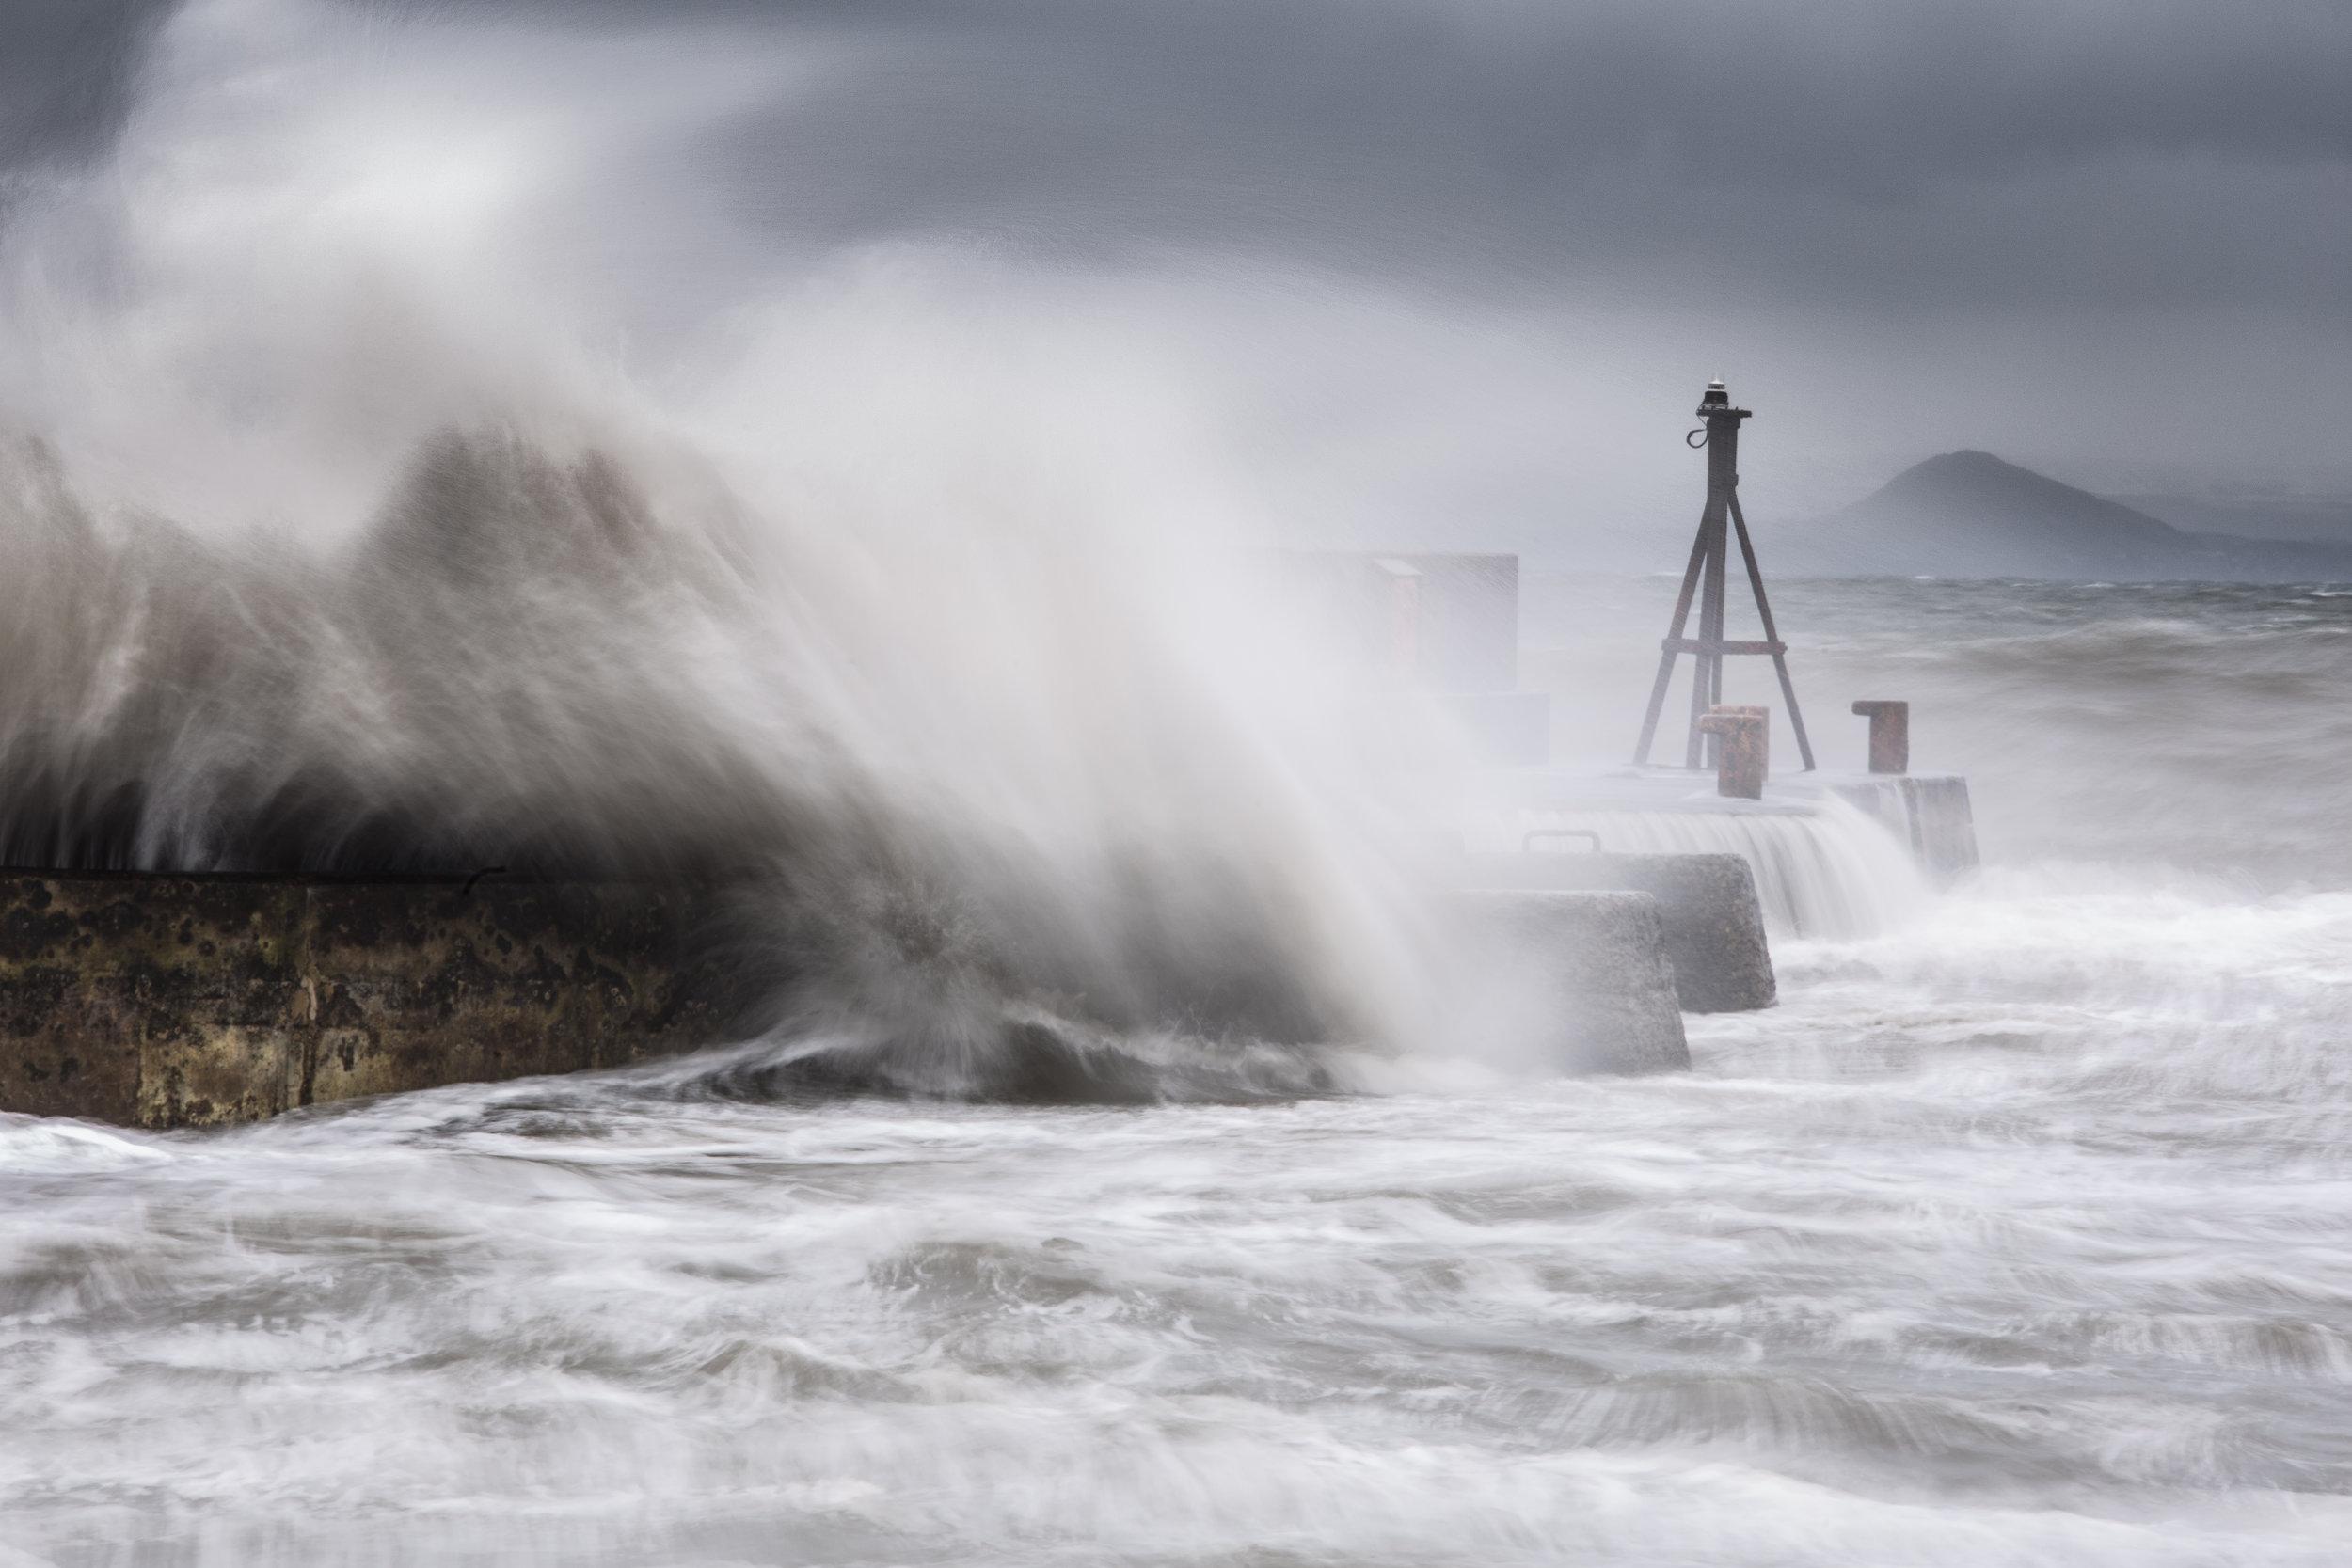 Storm Breaker by Andy Clark